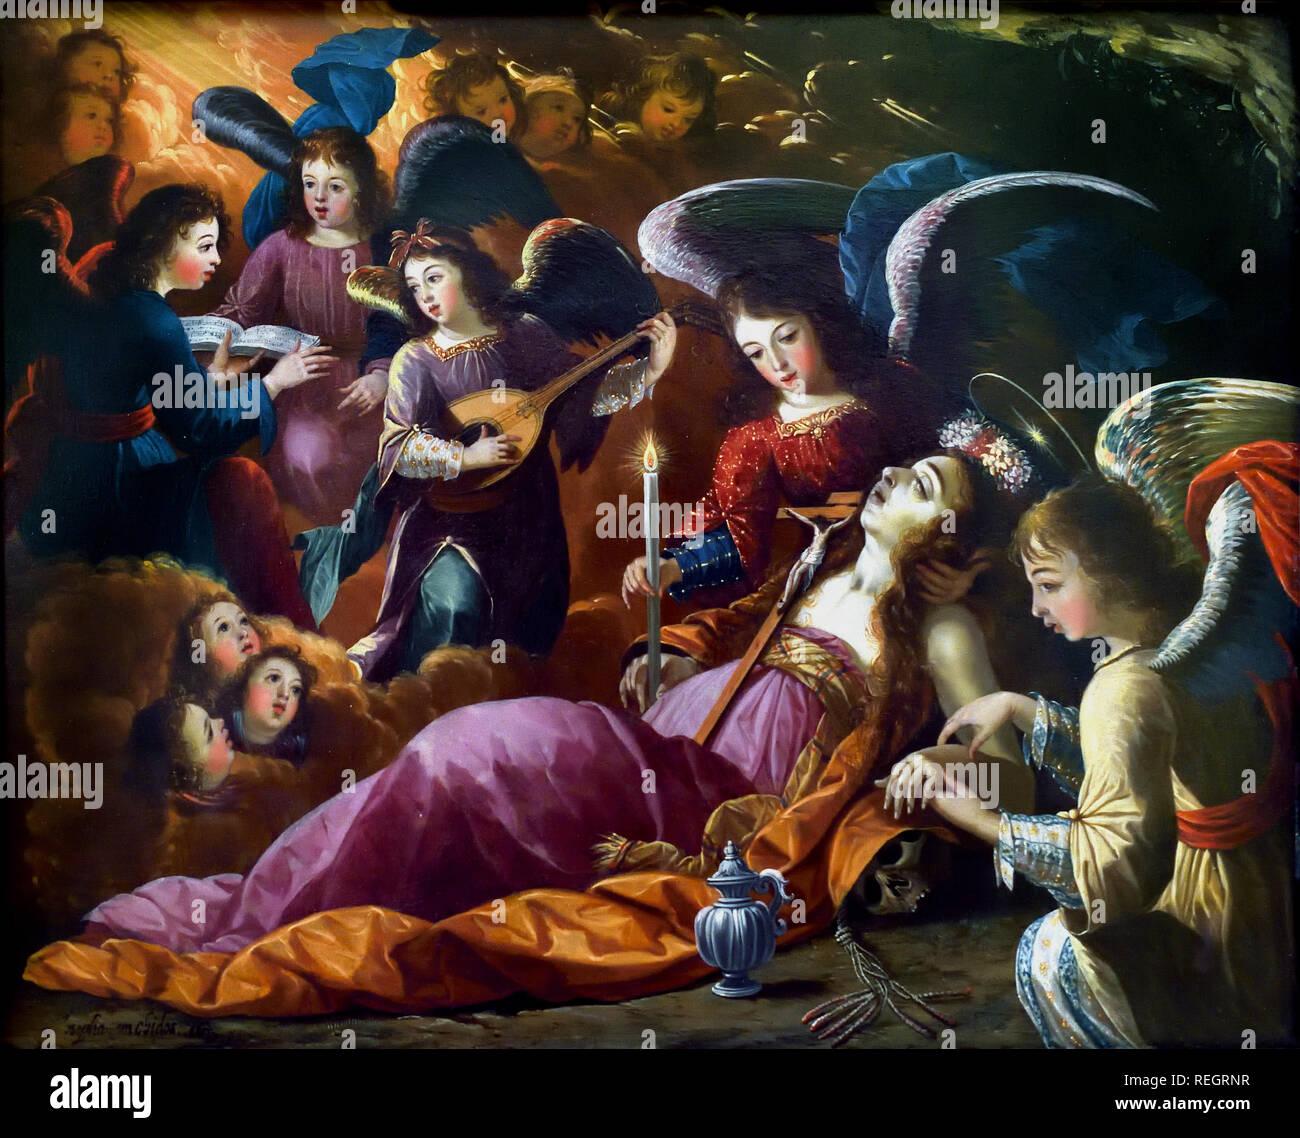 St Mary Of The Angels Catholic Church Stock Photos & St Mary